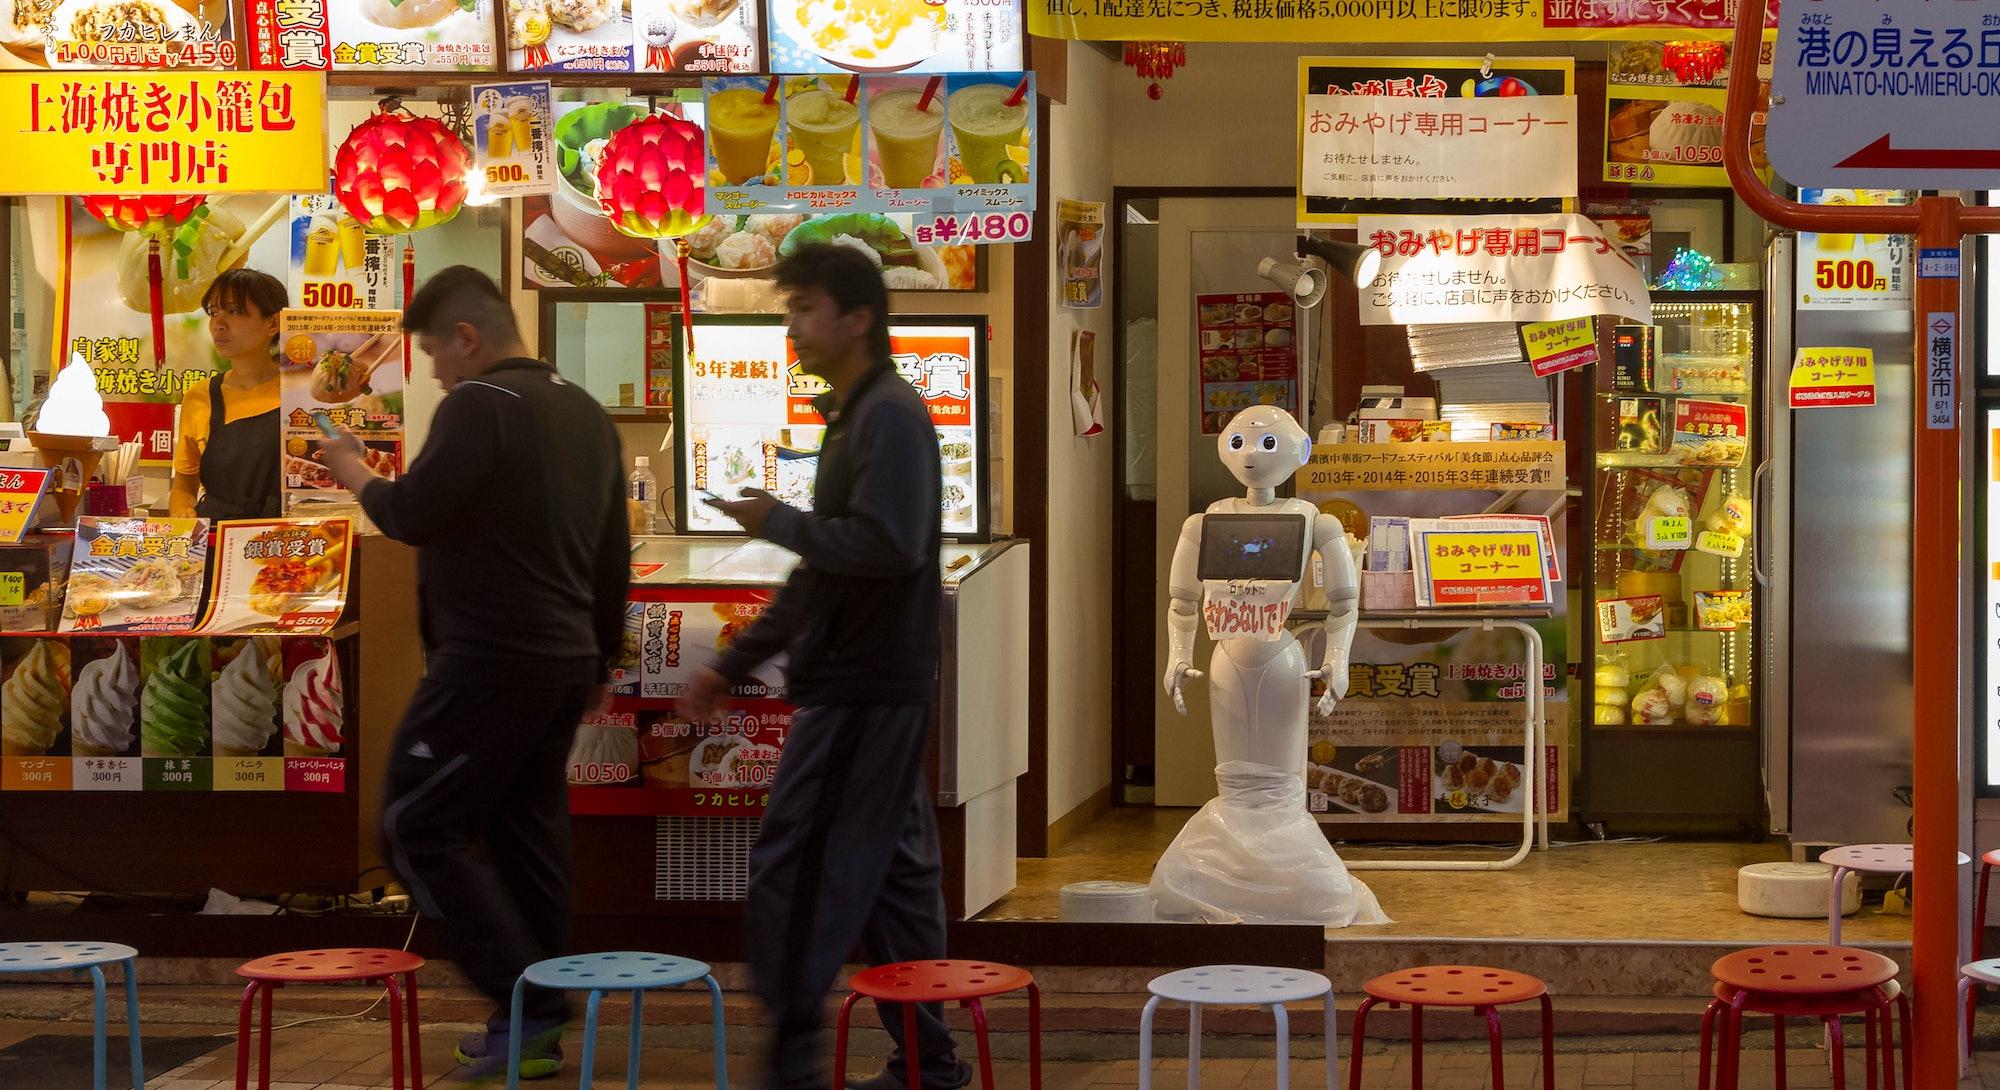 OMOTESANDO, JAPAN - 2016/07/29: A humanoid Pepper robot welcomes people to a restaurant in Yokohama ...